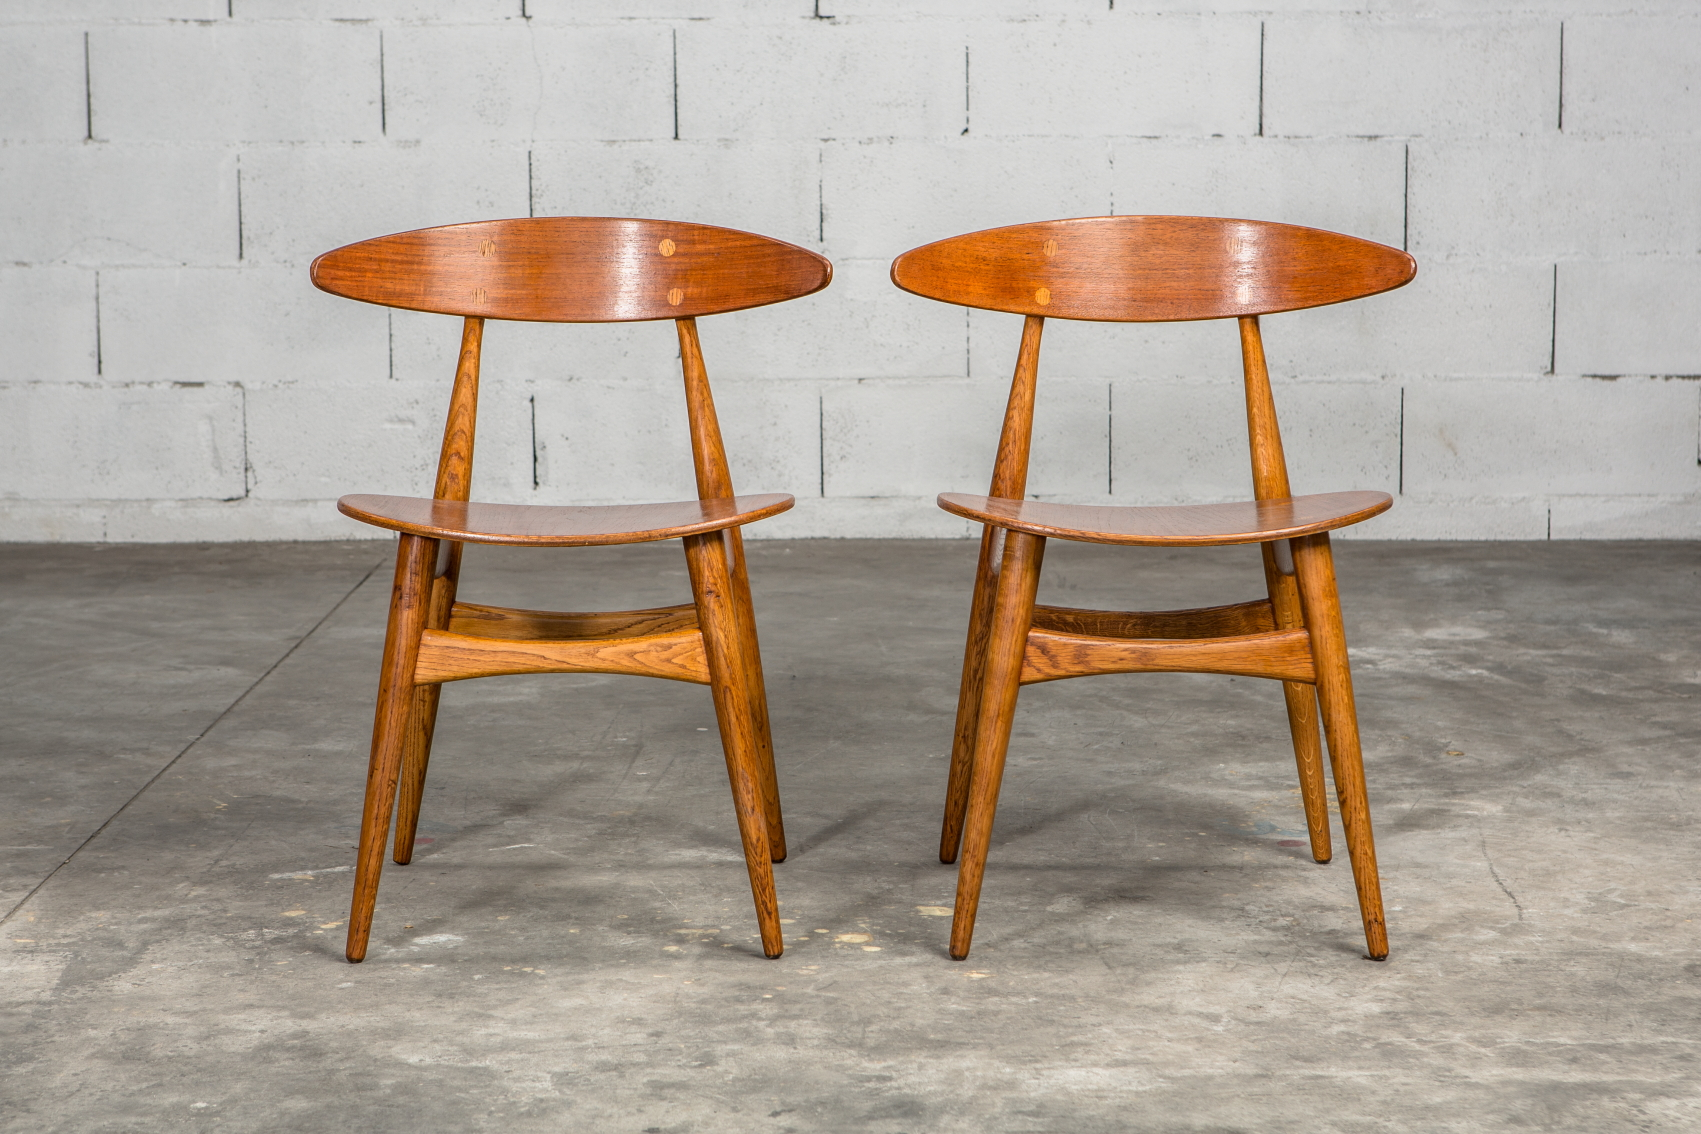 Molded teak backrests and oak frames CH 33 chairs - Hans J. Wegner for Carl Hansen & Son - Front view 2